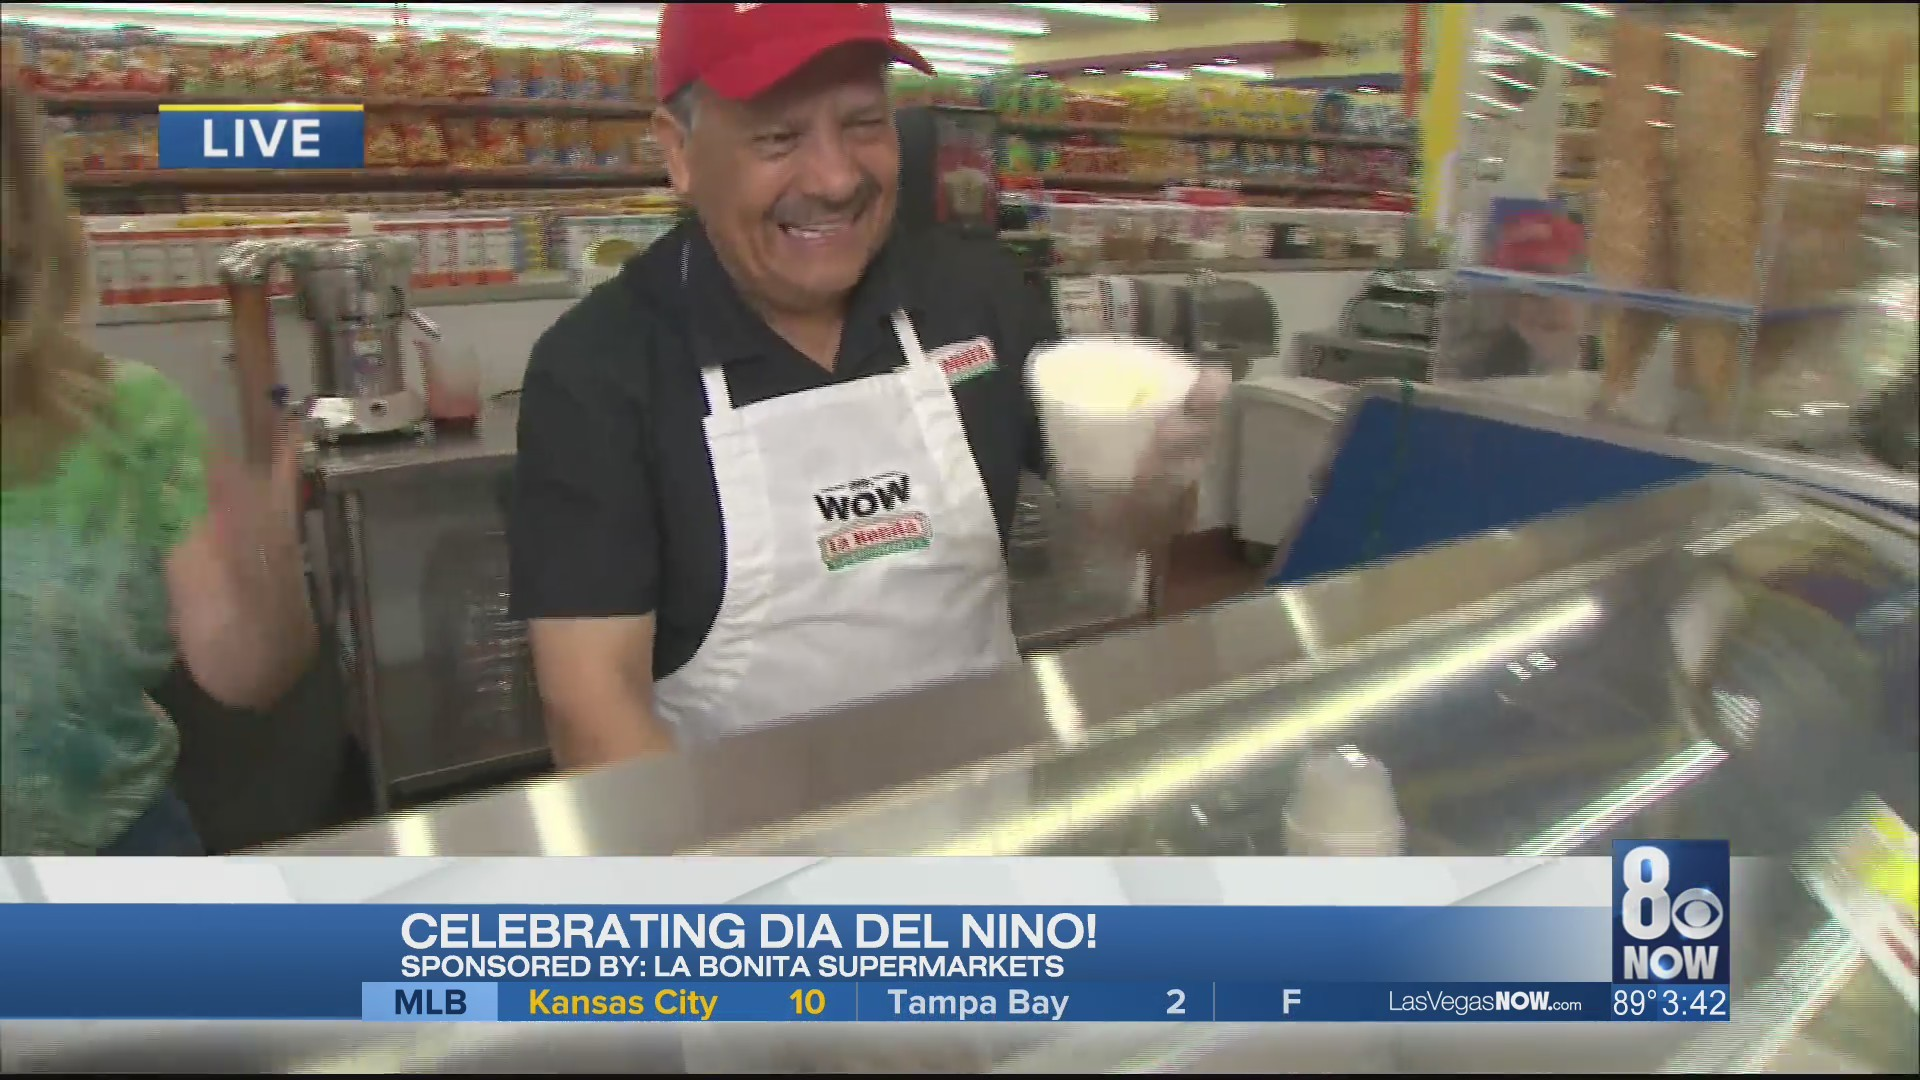 Celebrating Dia Del Nino with La Bonita